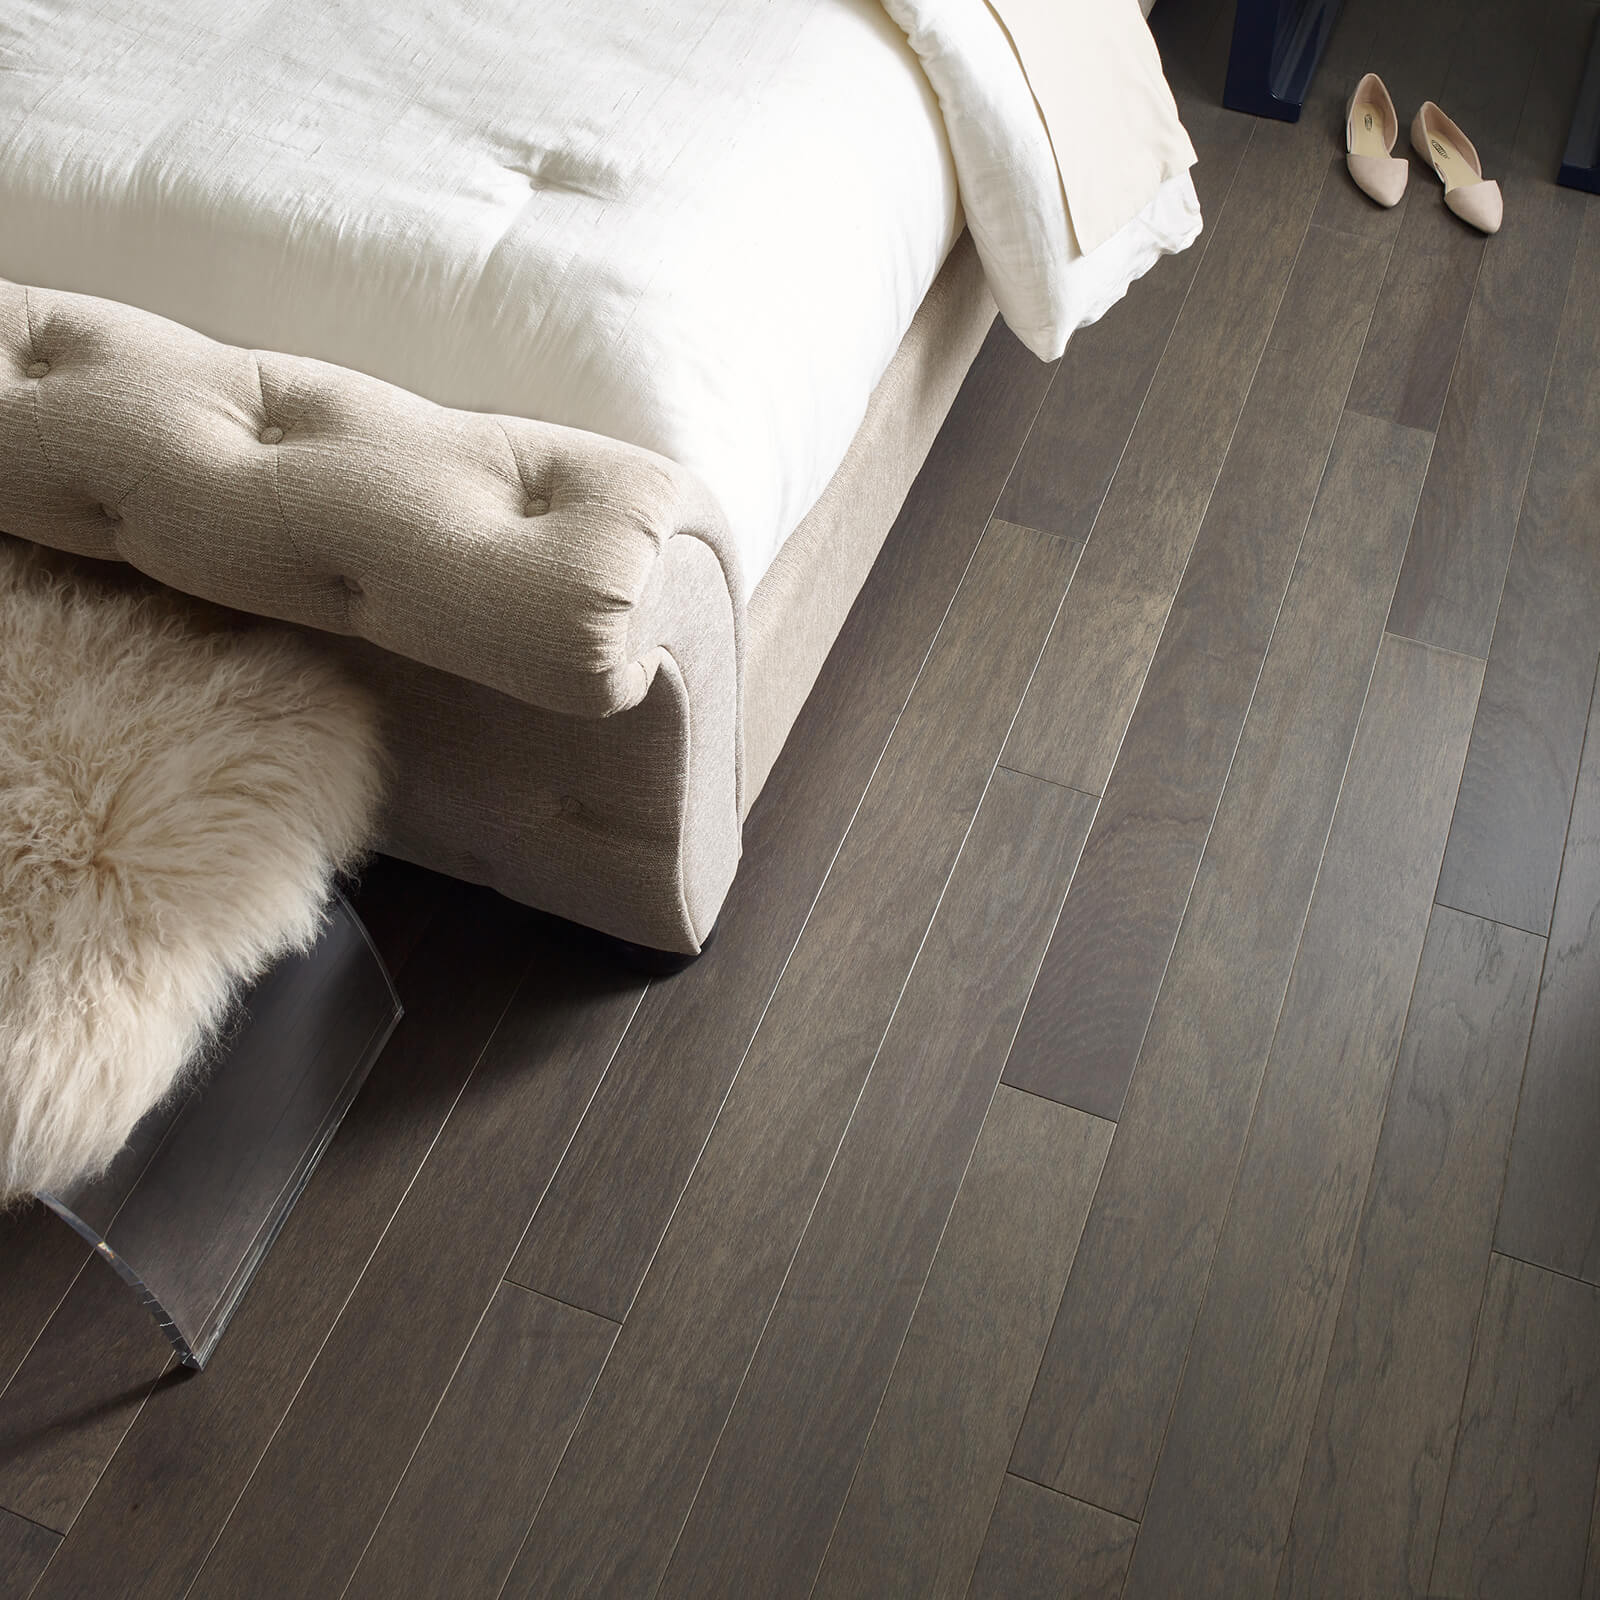 Northington smooth flooring | Dolphin Carpet & Tile